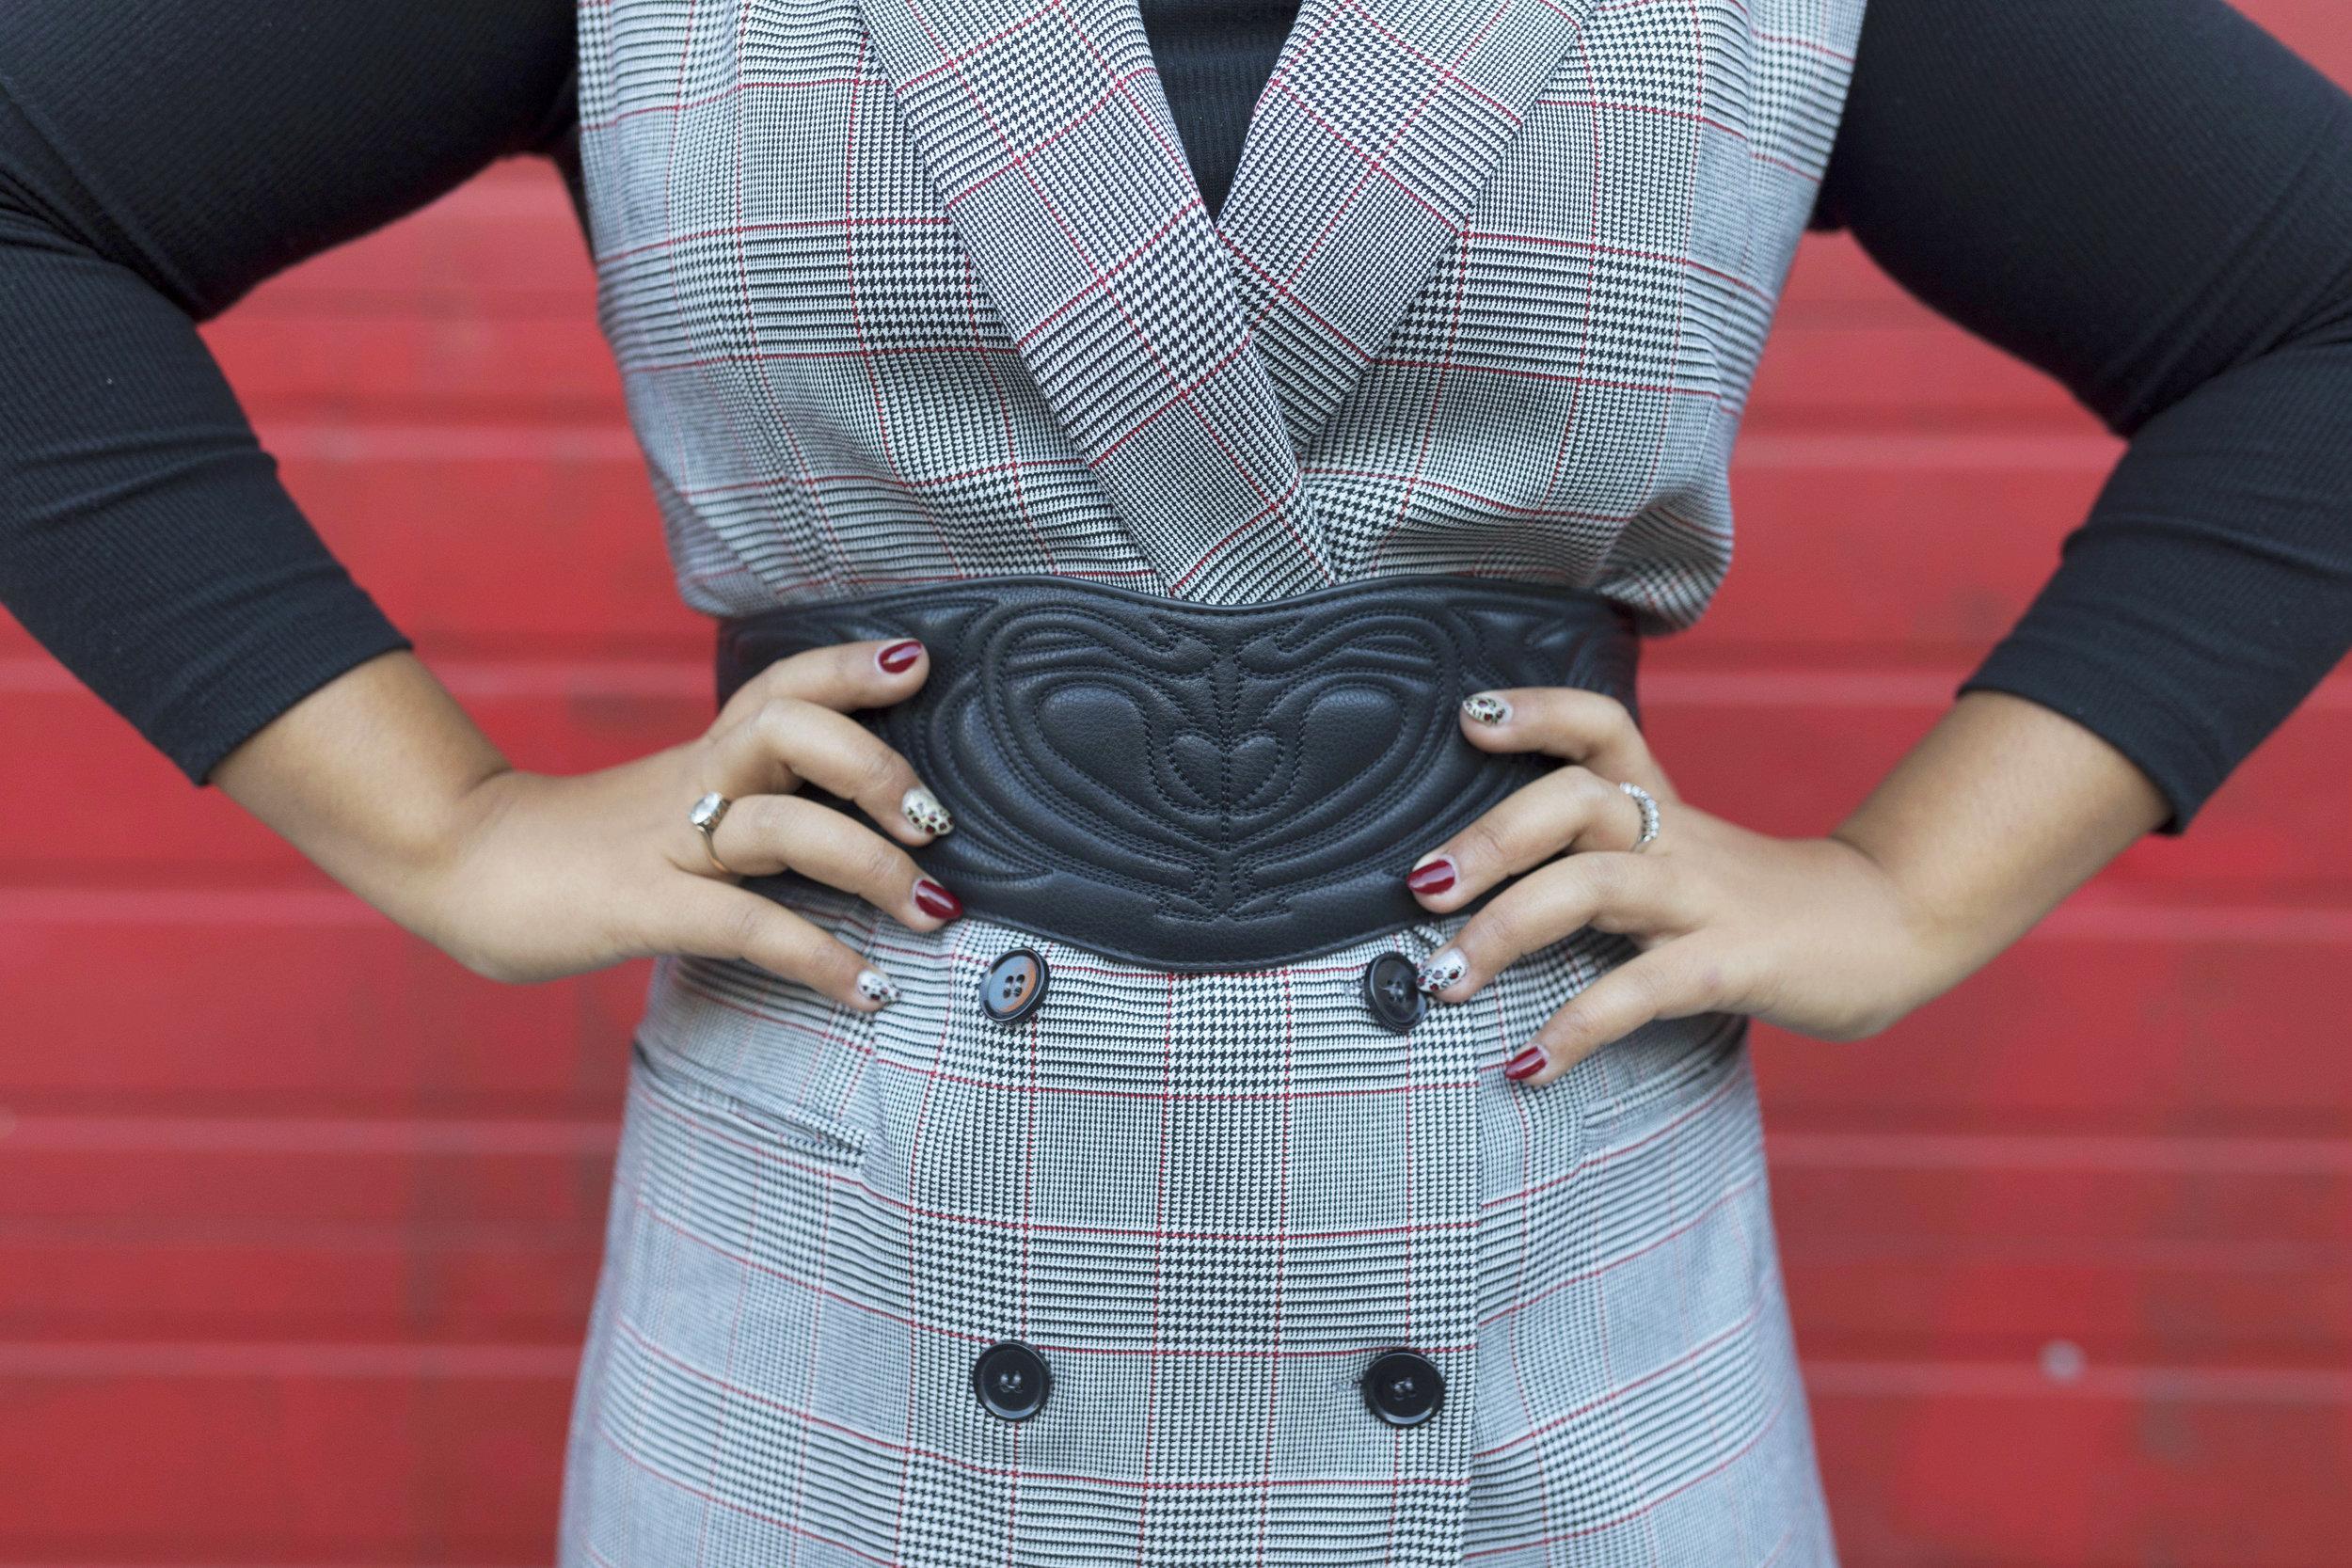 Krity S x Checked Tailored Dress worn Two Ways6.jpg